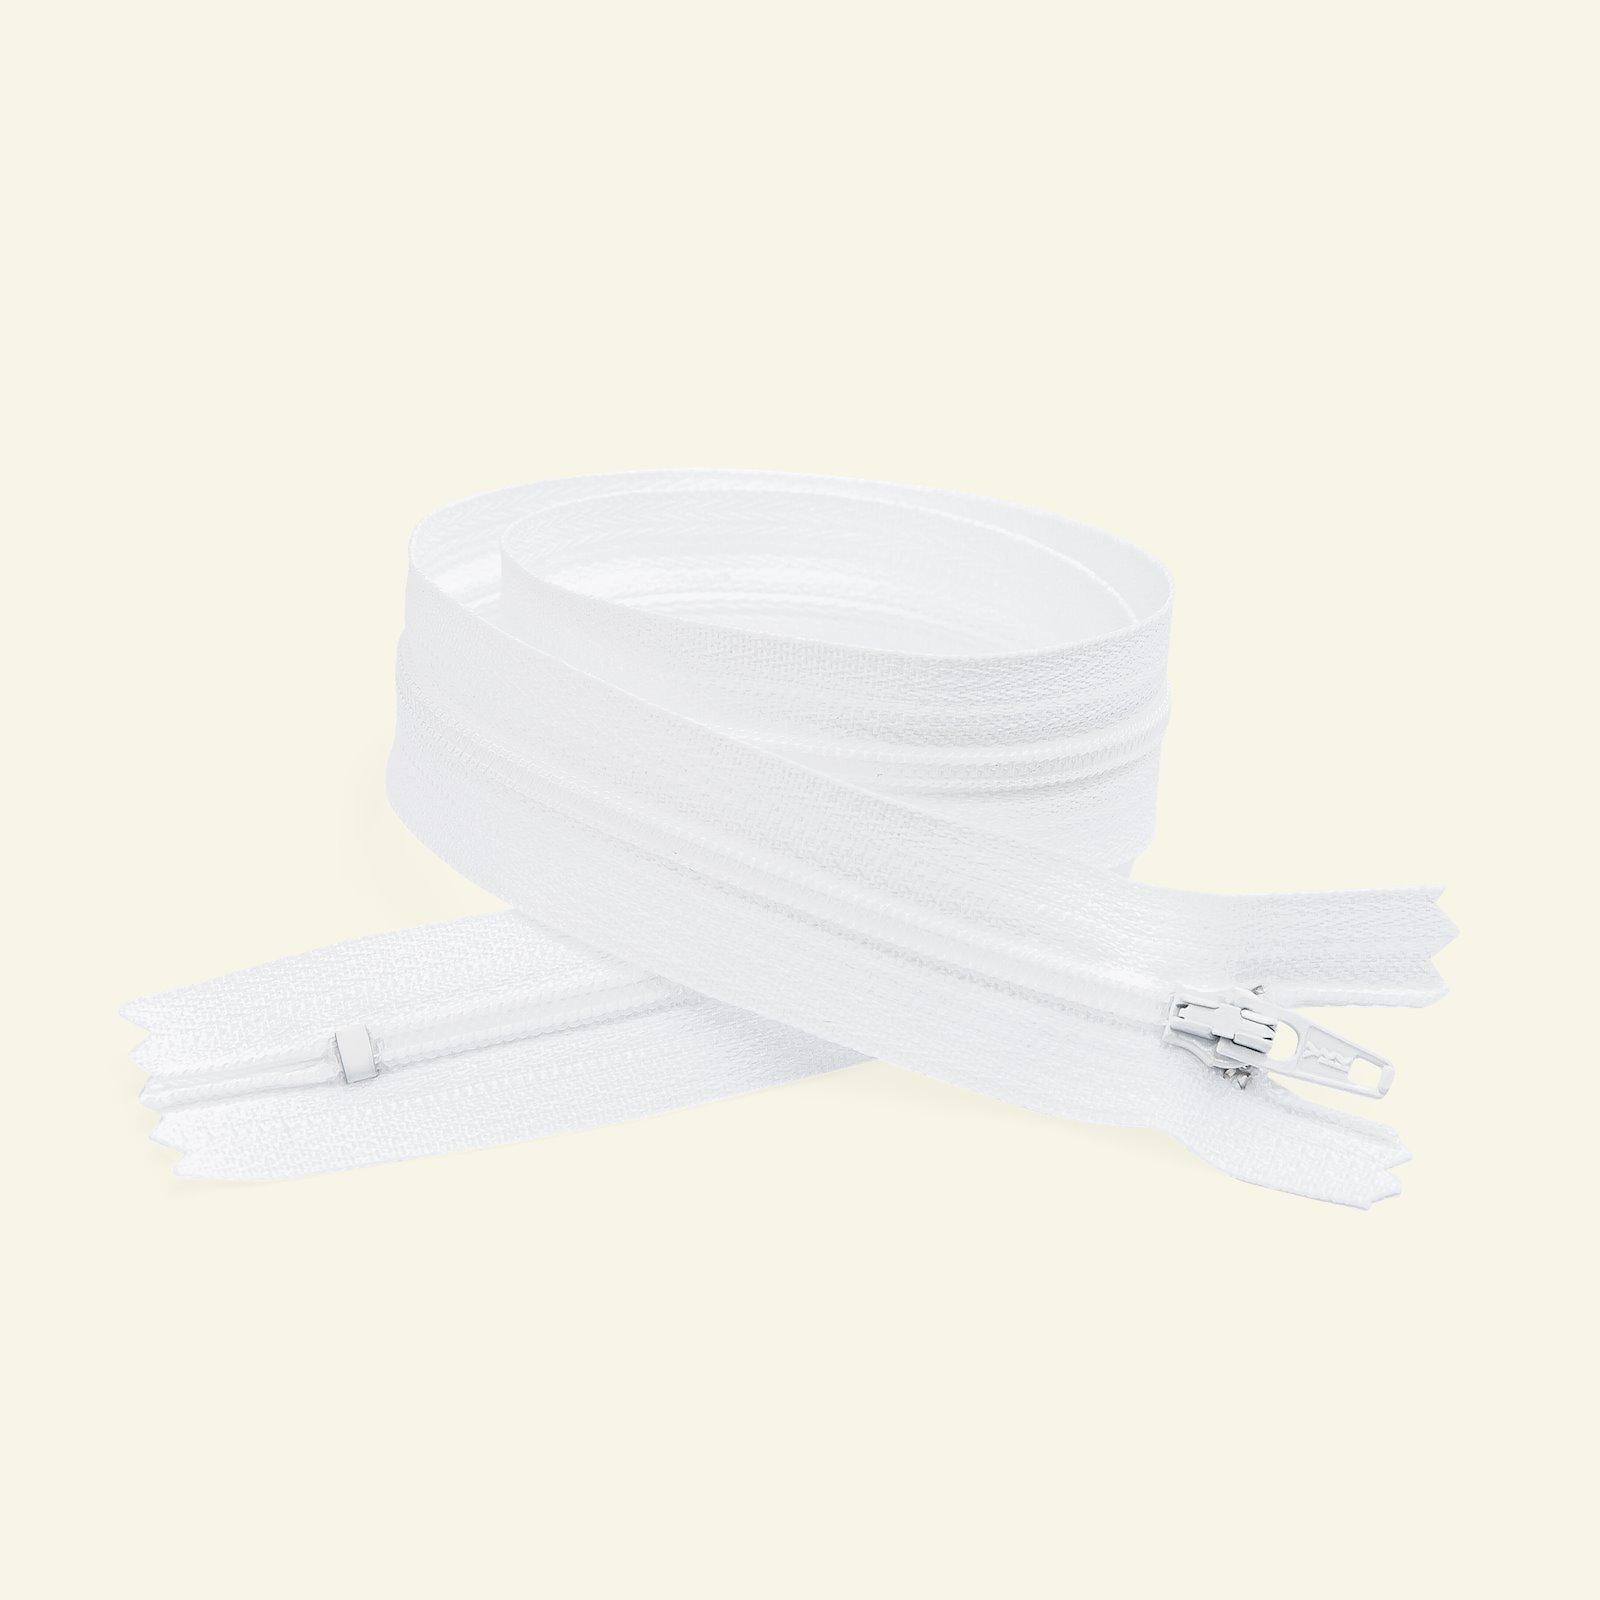 YKK zip 4mm closed end 50cm white x40501_pack